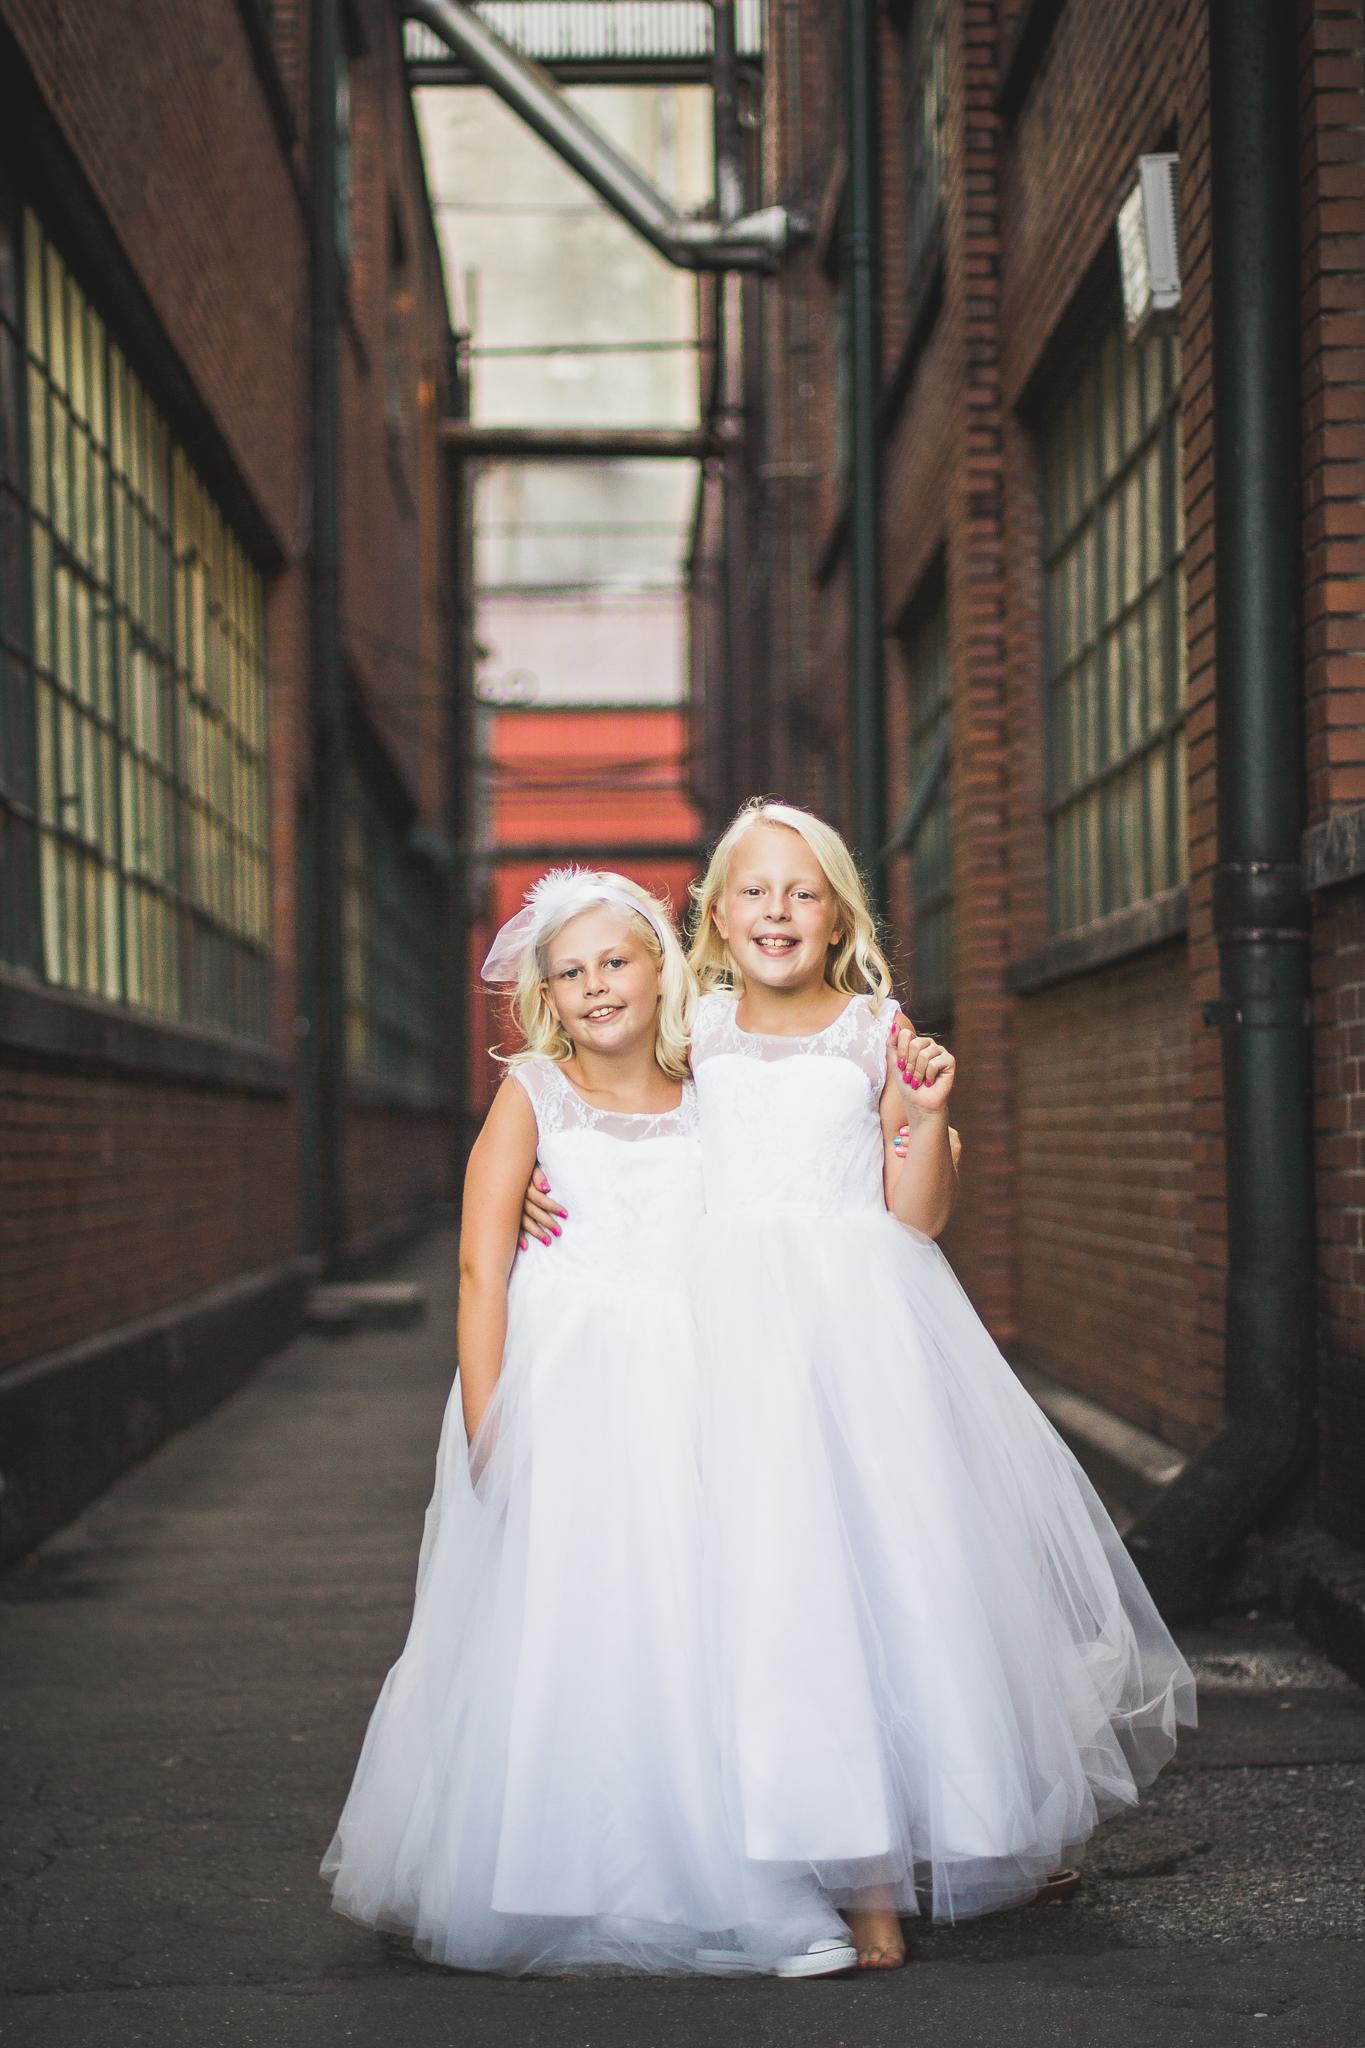 Richmond Kentucky Wedding Photographer - Ariana Jordan Photography -26-2.jpg